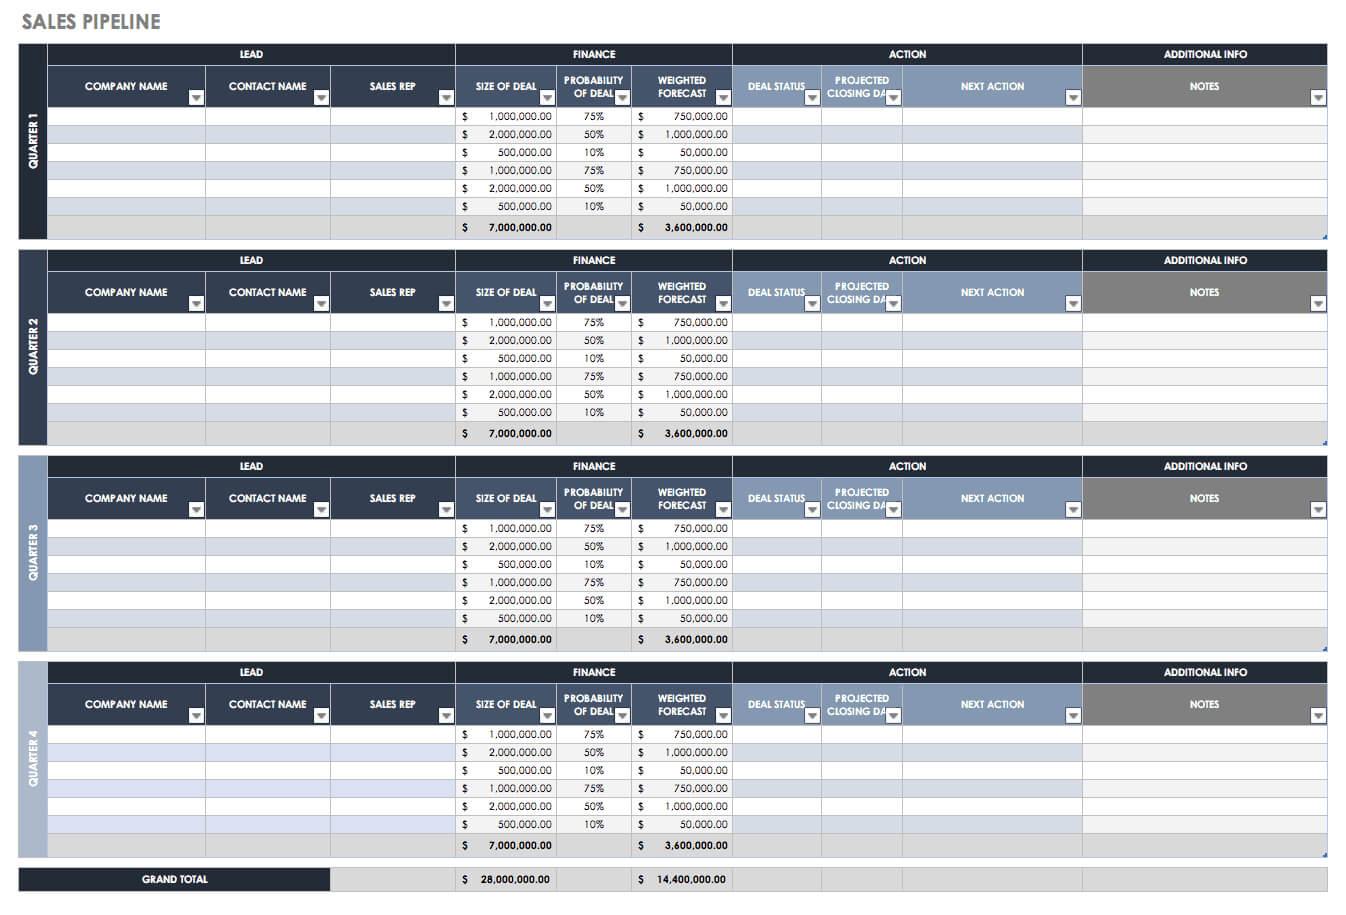 Free Sales Pipeline Templates | Smartsheet With Regard To Sales Funnel Report Template